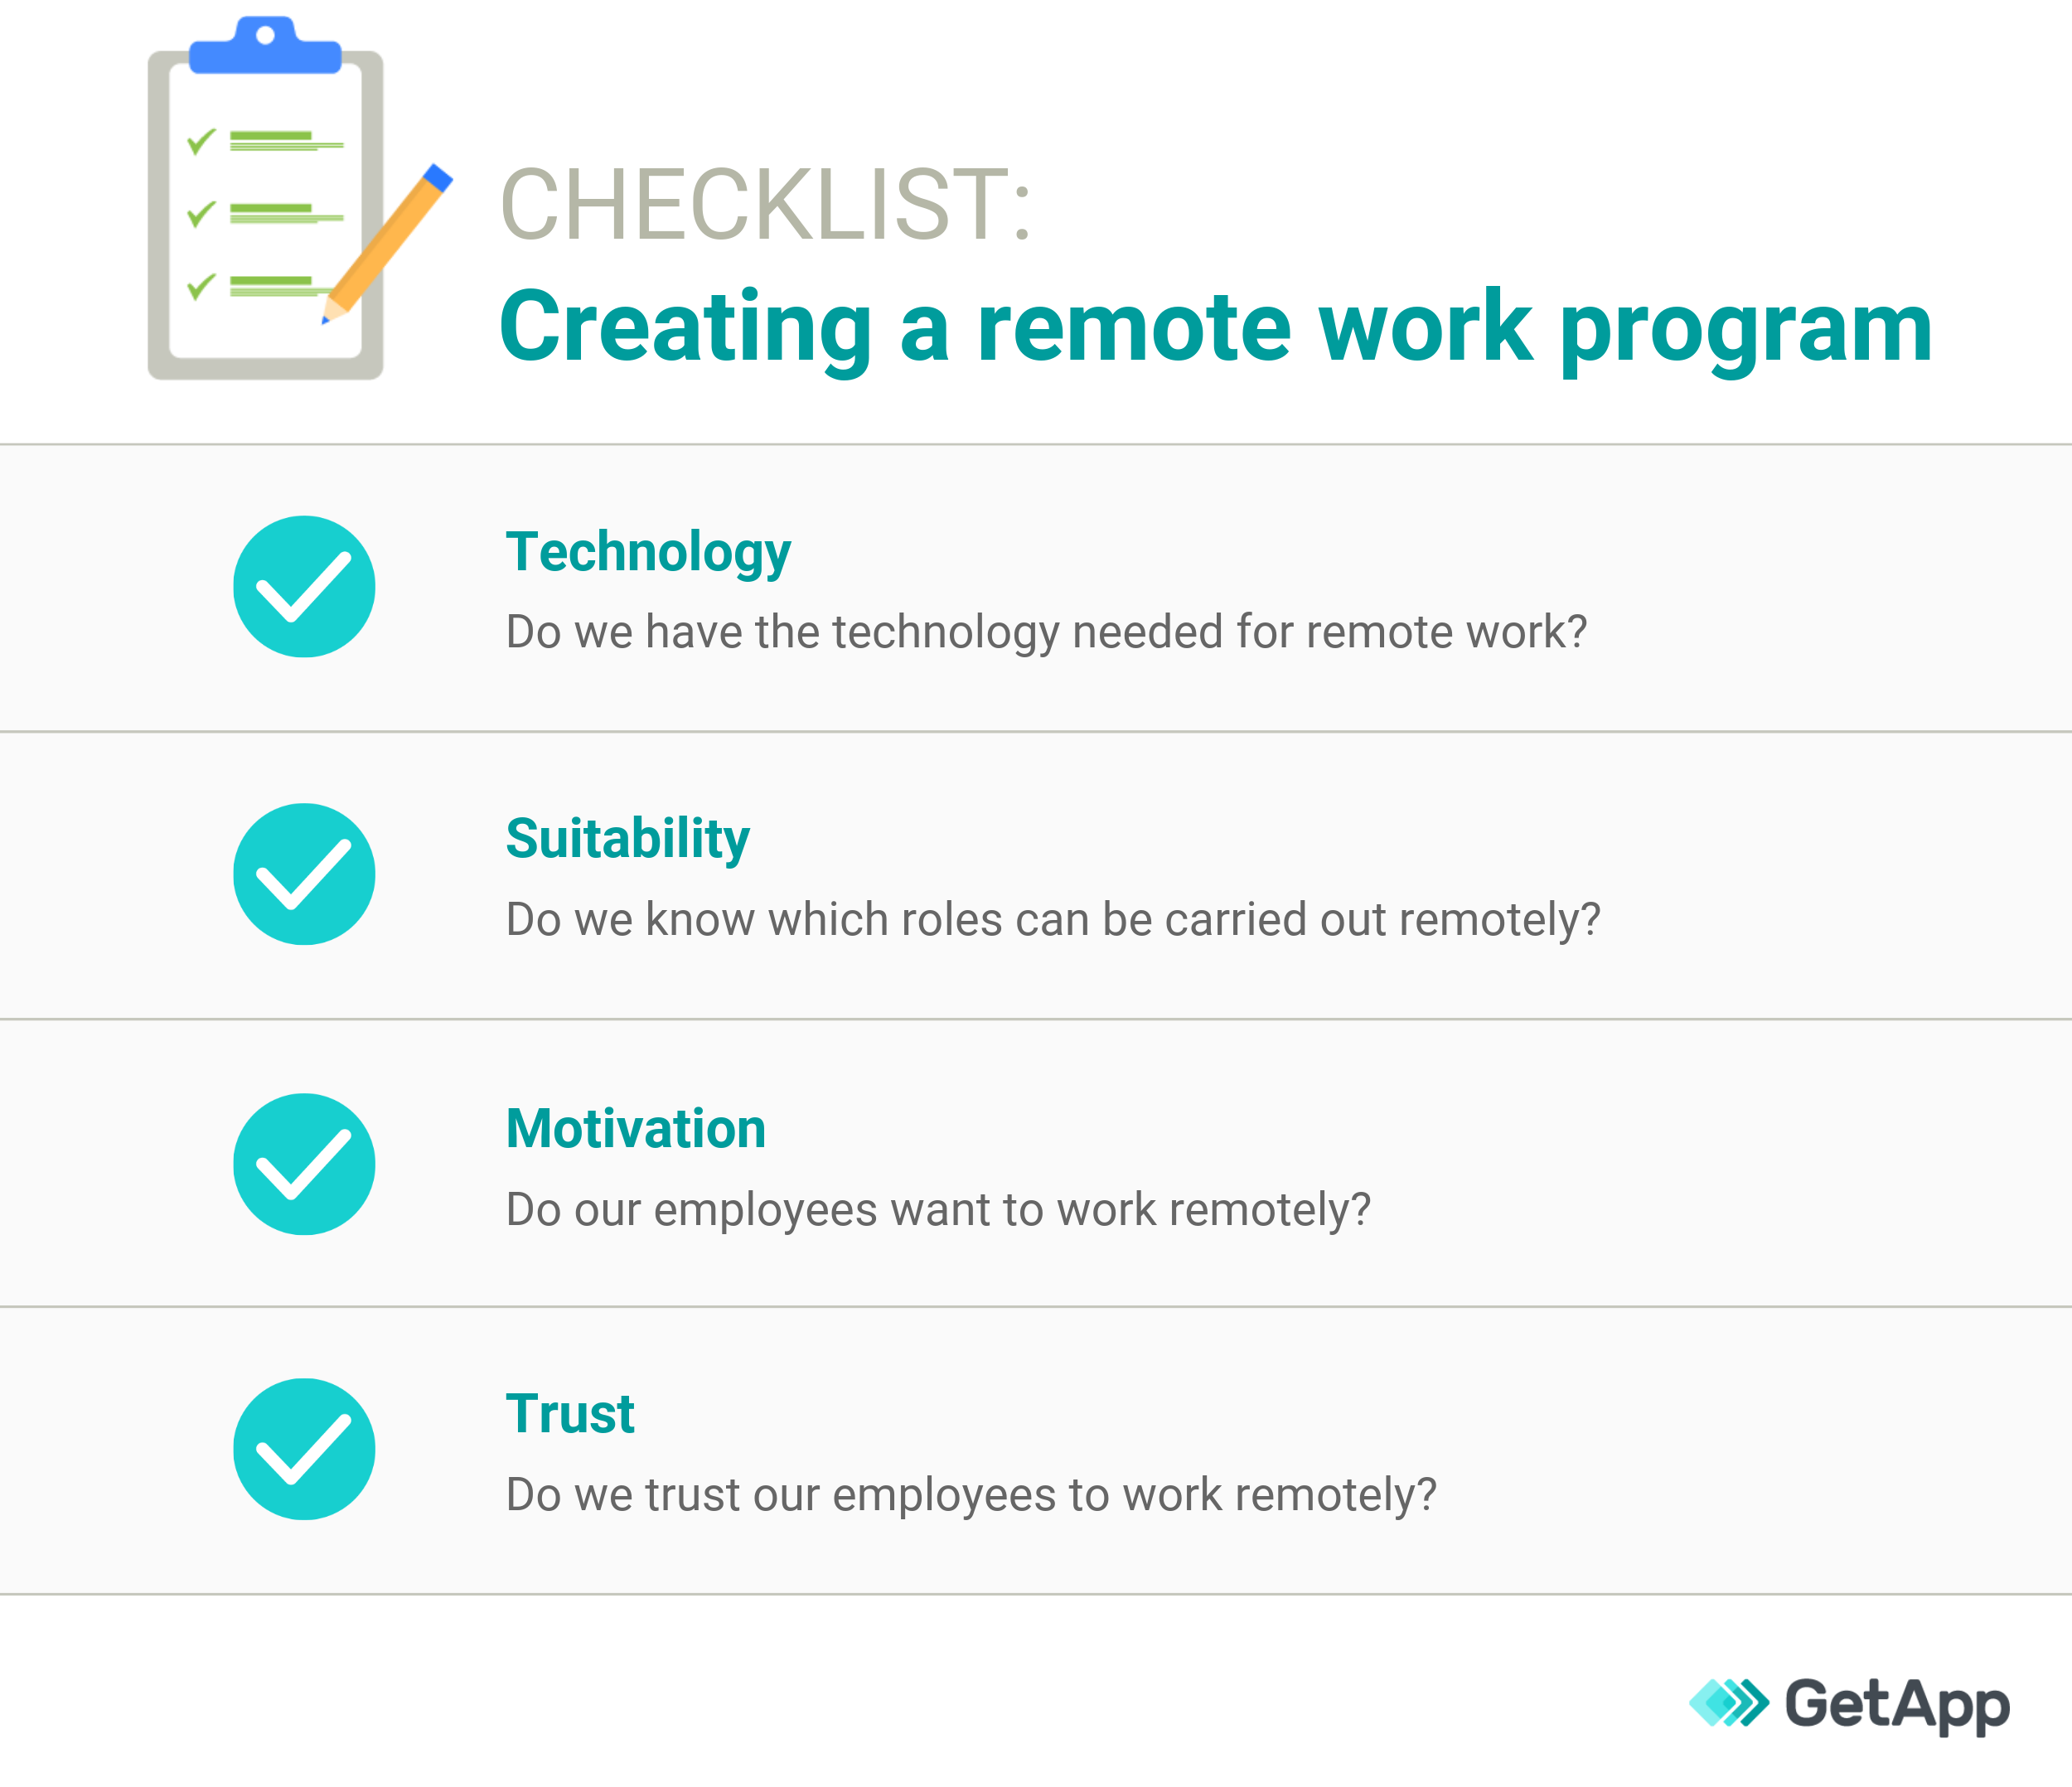 Creating a remote work program checklist graphic